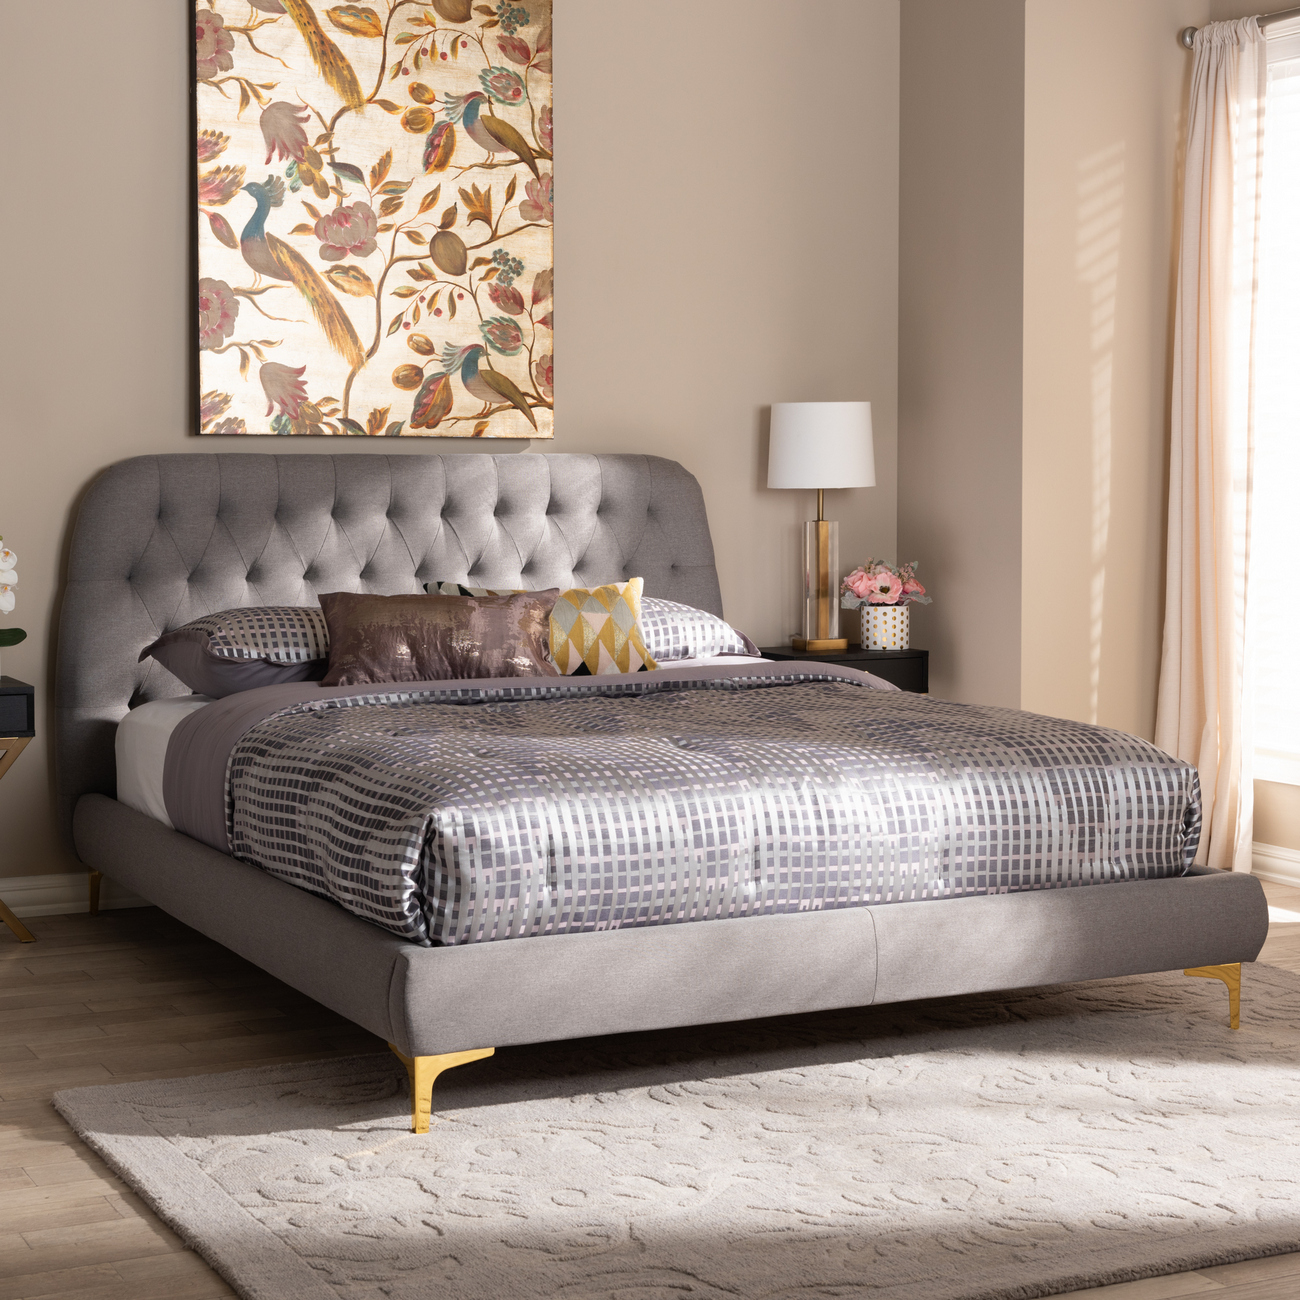 Upholster | Platform | Fabric | Finish | Light | Grey | Full | Gold | Size | Bed | Leg